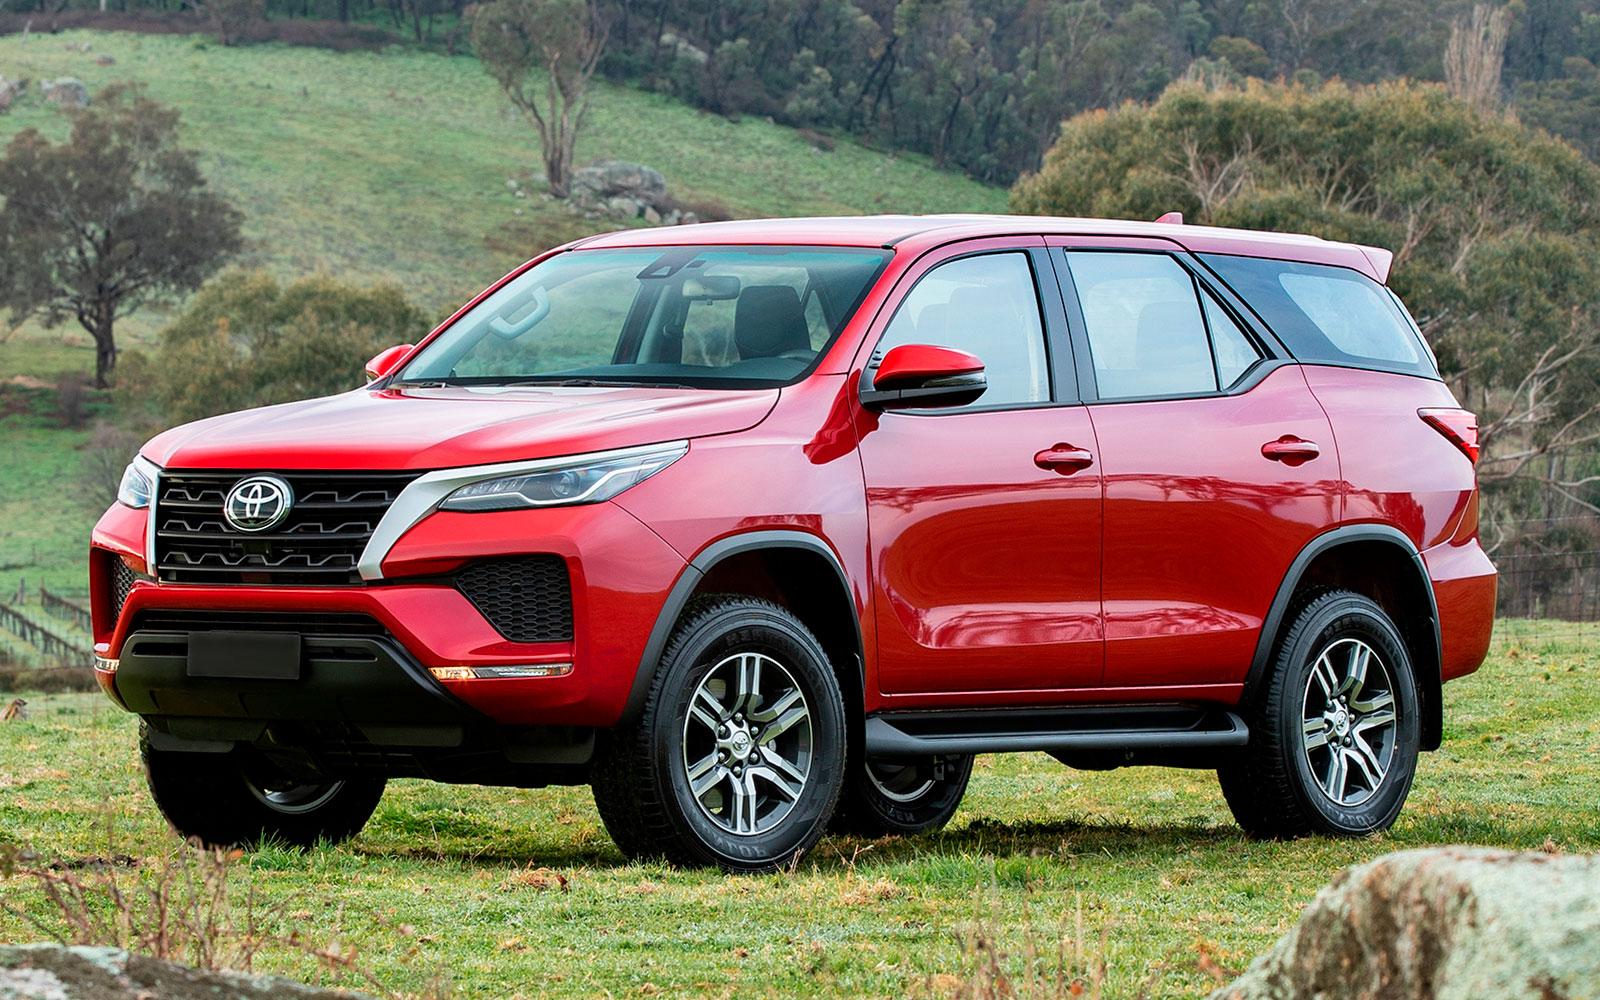 Toyota Fortuner (2020-2021) цена и характеристики, фотографии и обзор